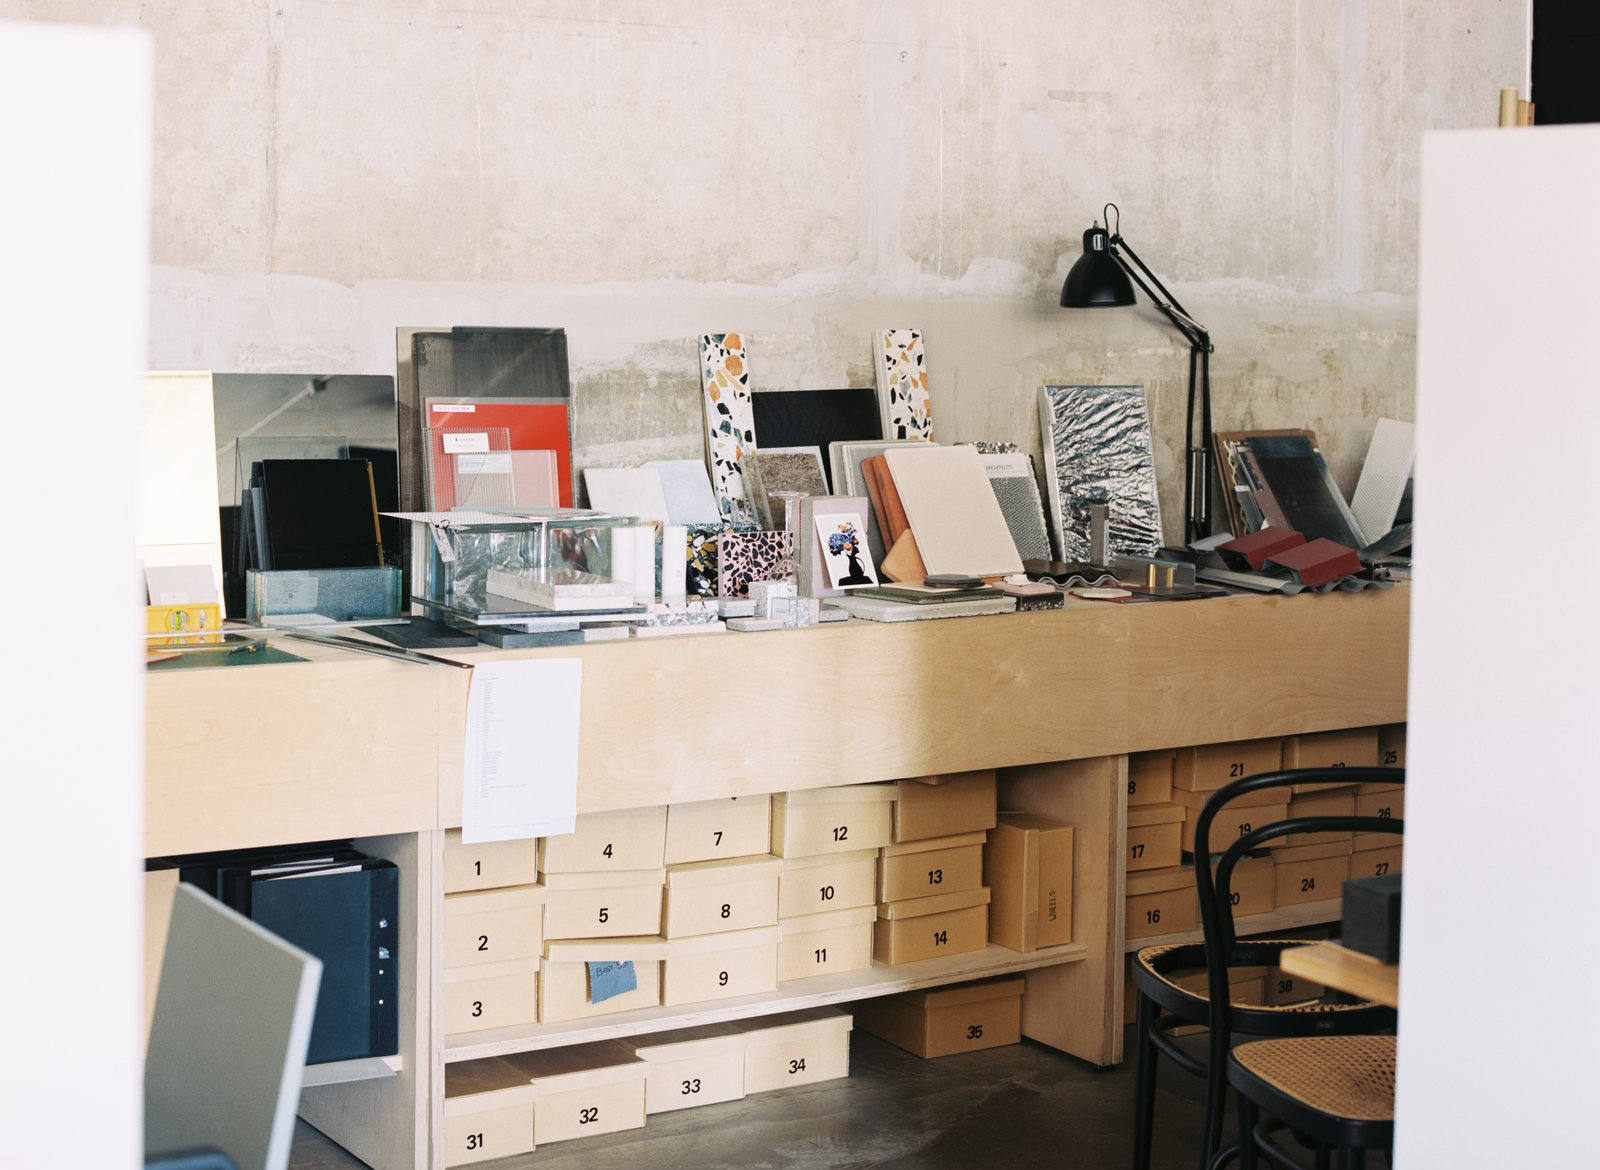 L'atelier de Bozarthfornell, bureau d'architecture